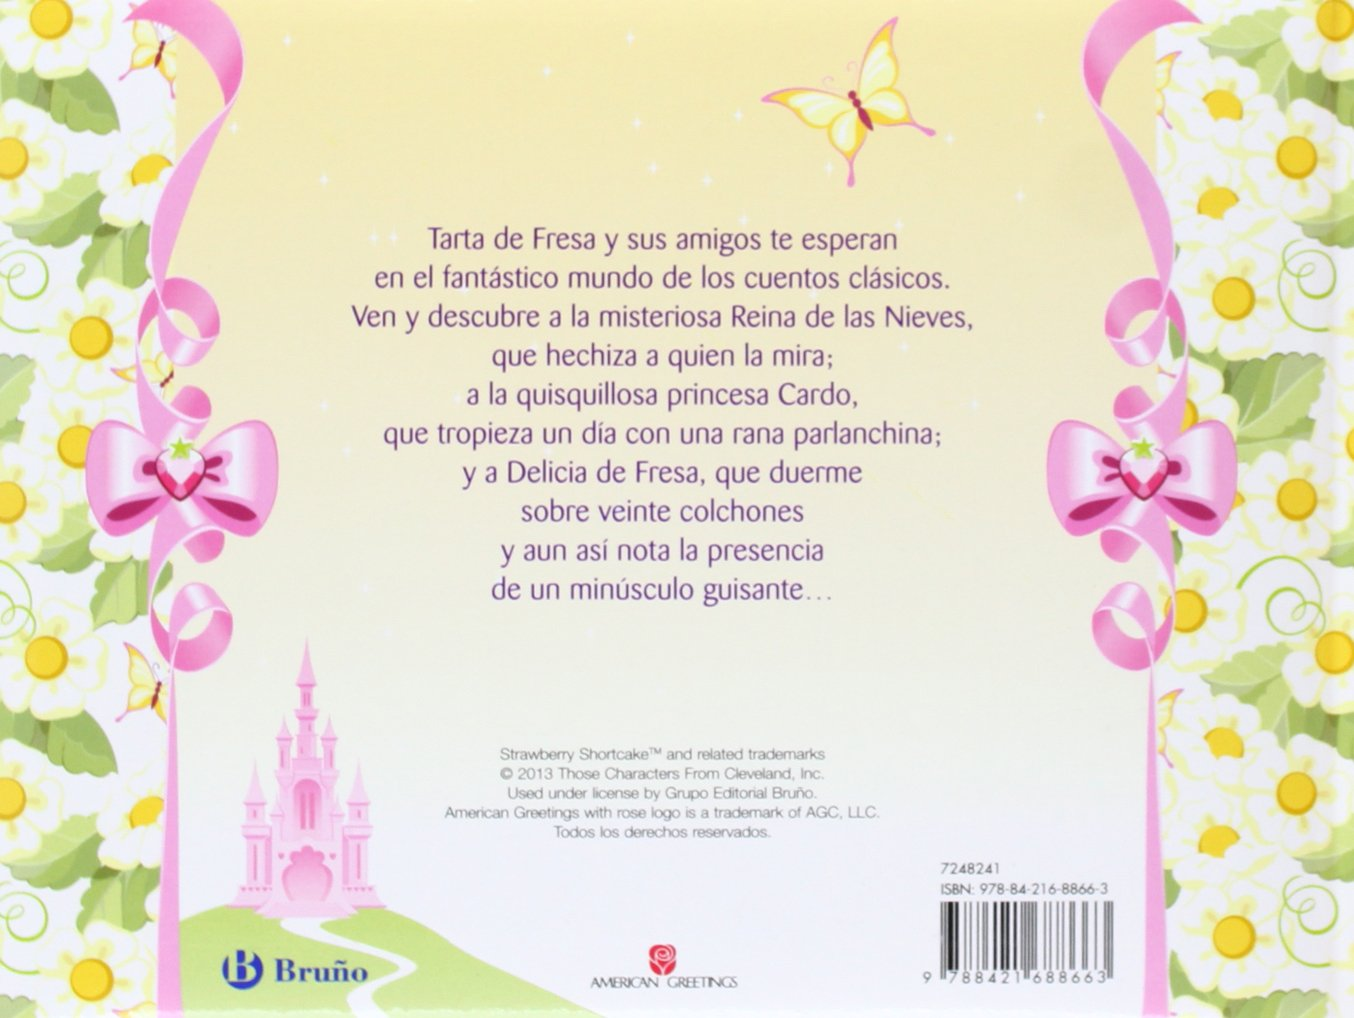 Amazon.com: Nuevos cuentos de princesas / New Tales of princesses (Tarta de fresa / Strawberry Shortcake) (Spanish Edition) (9788421688663): Sara Álvarez, ...